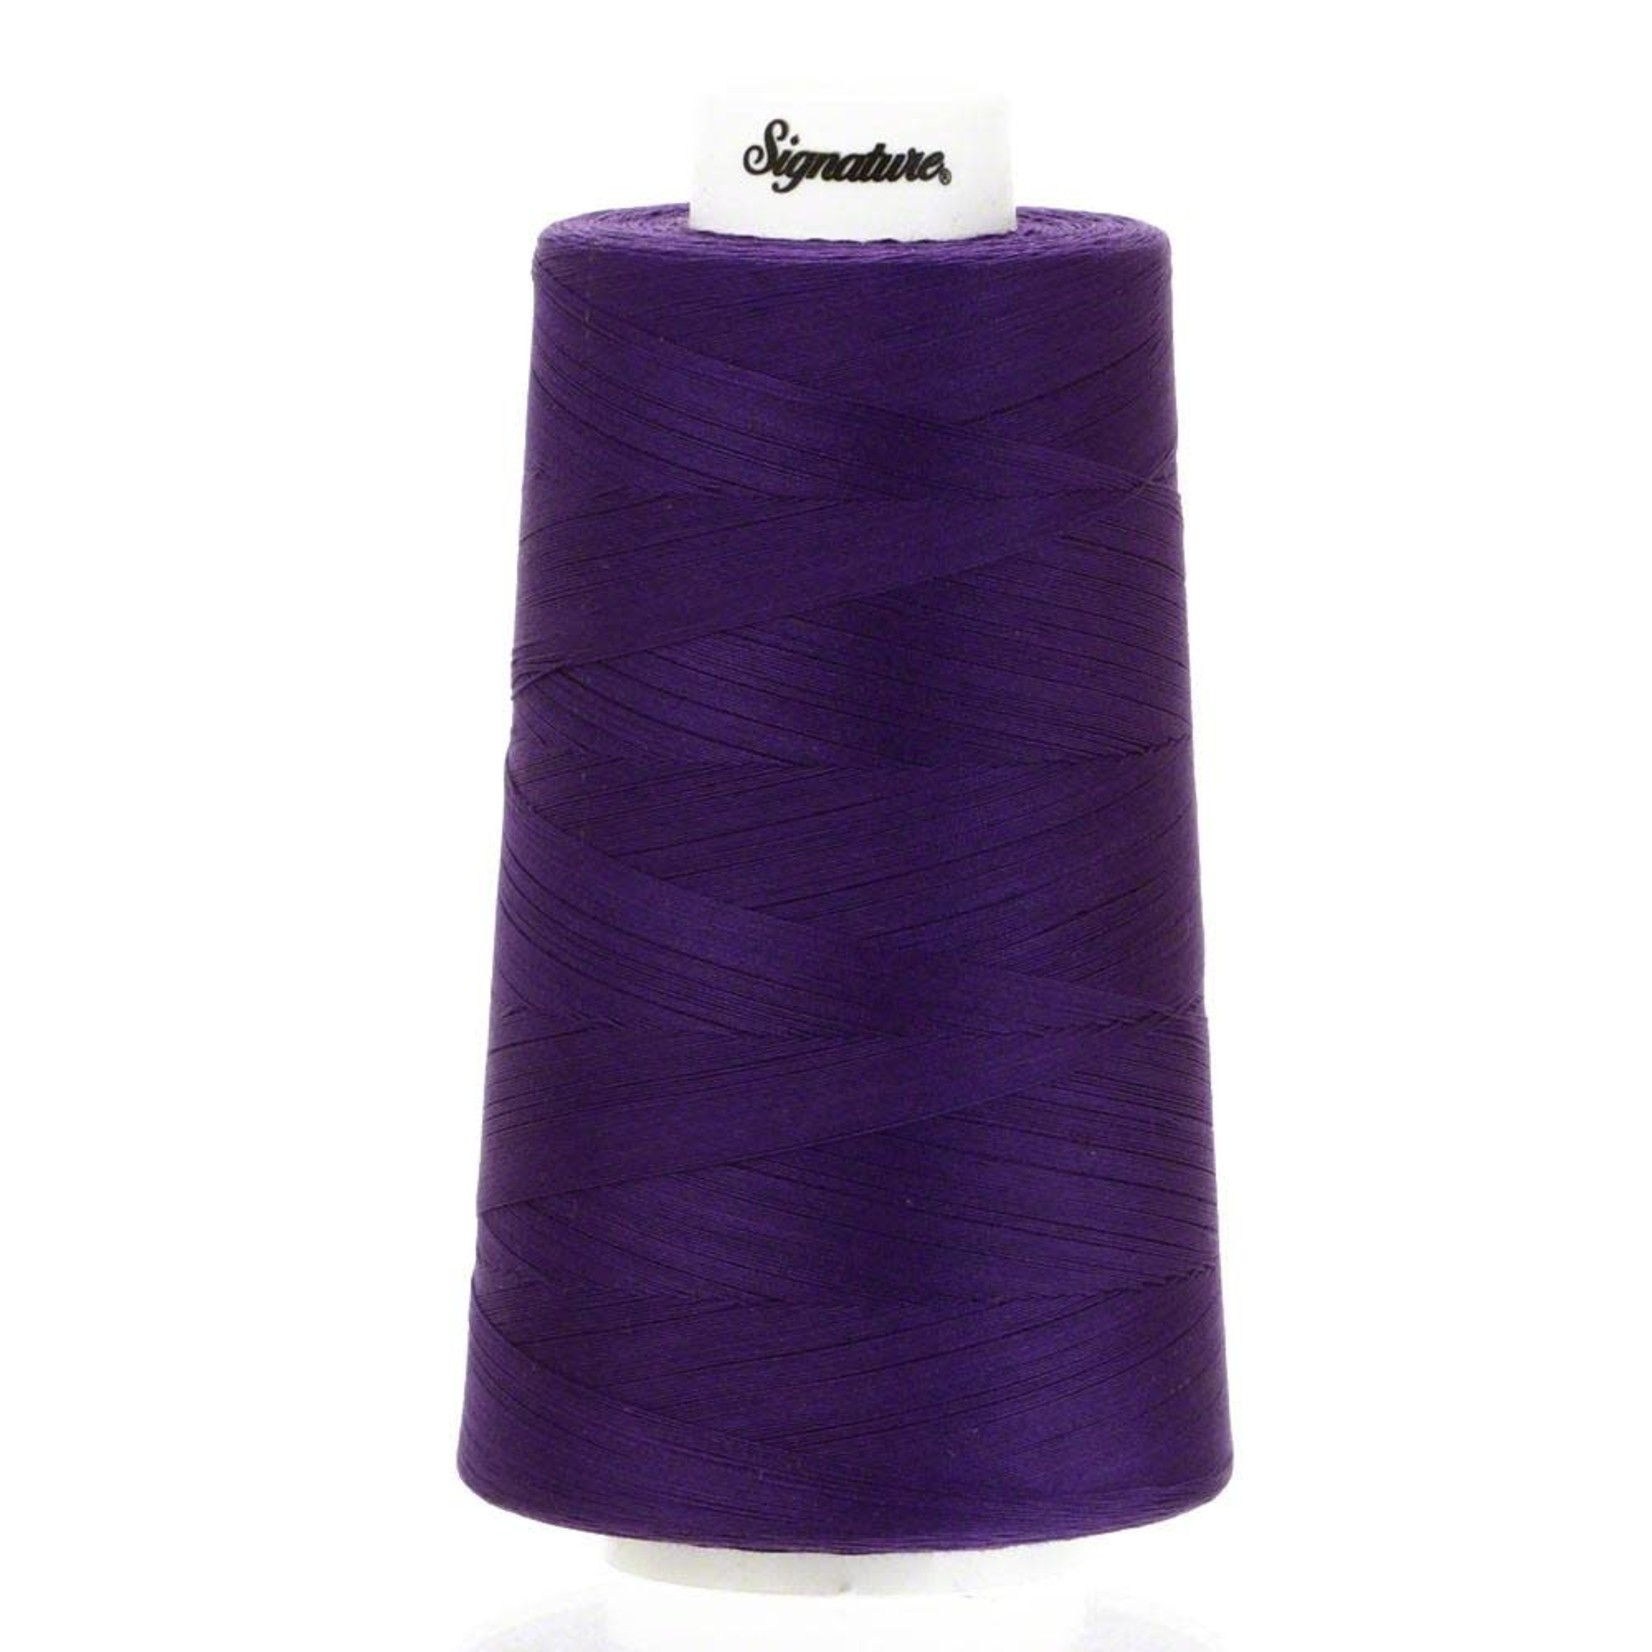 A & E Purple Jewel, Signature Cotton